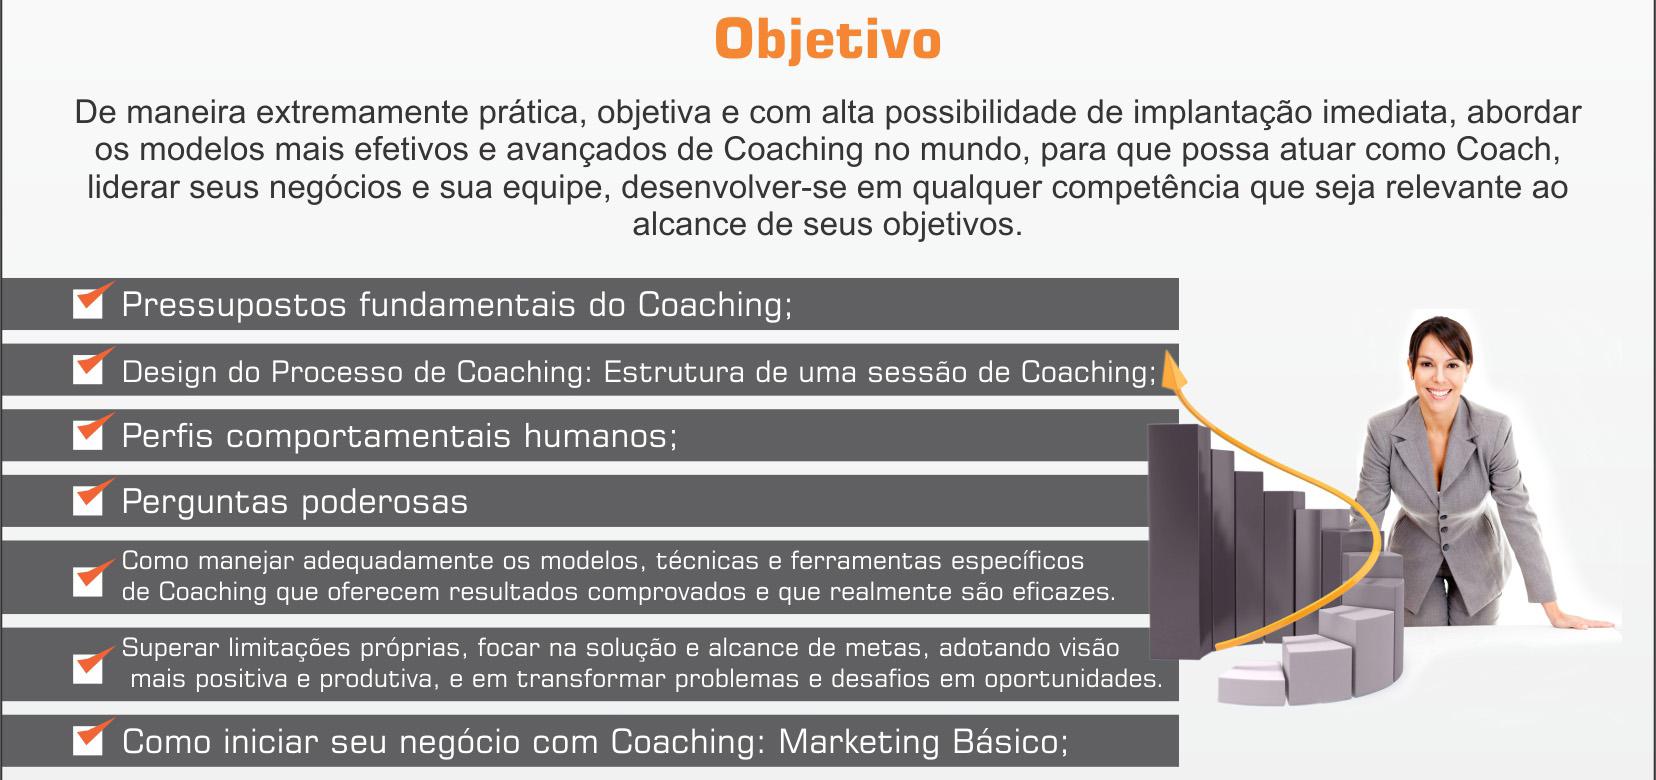 flirt coaching tag 2 Flirt mastery kurs (für männer): coaching: draftcast live 2018, tag 2 derdraft 104 watching live now.